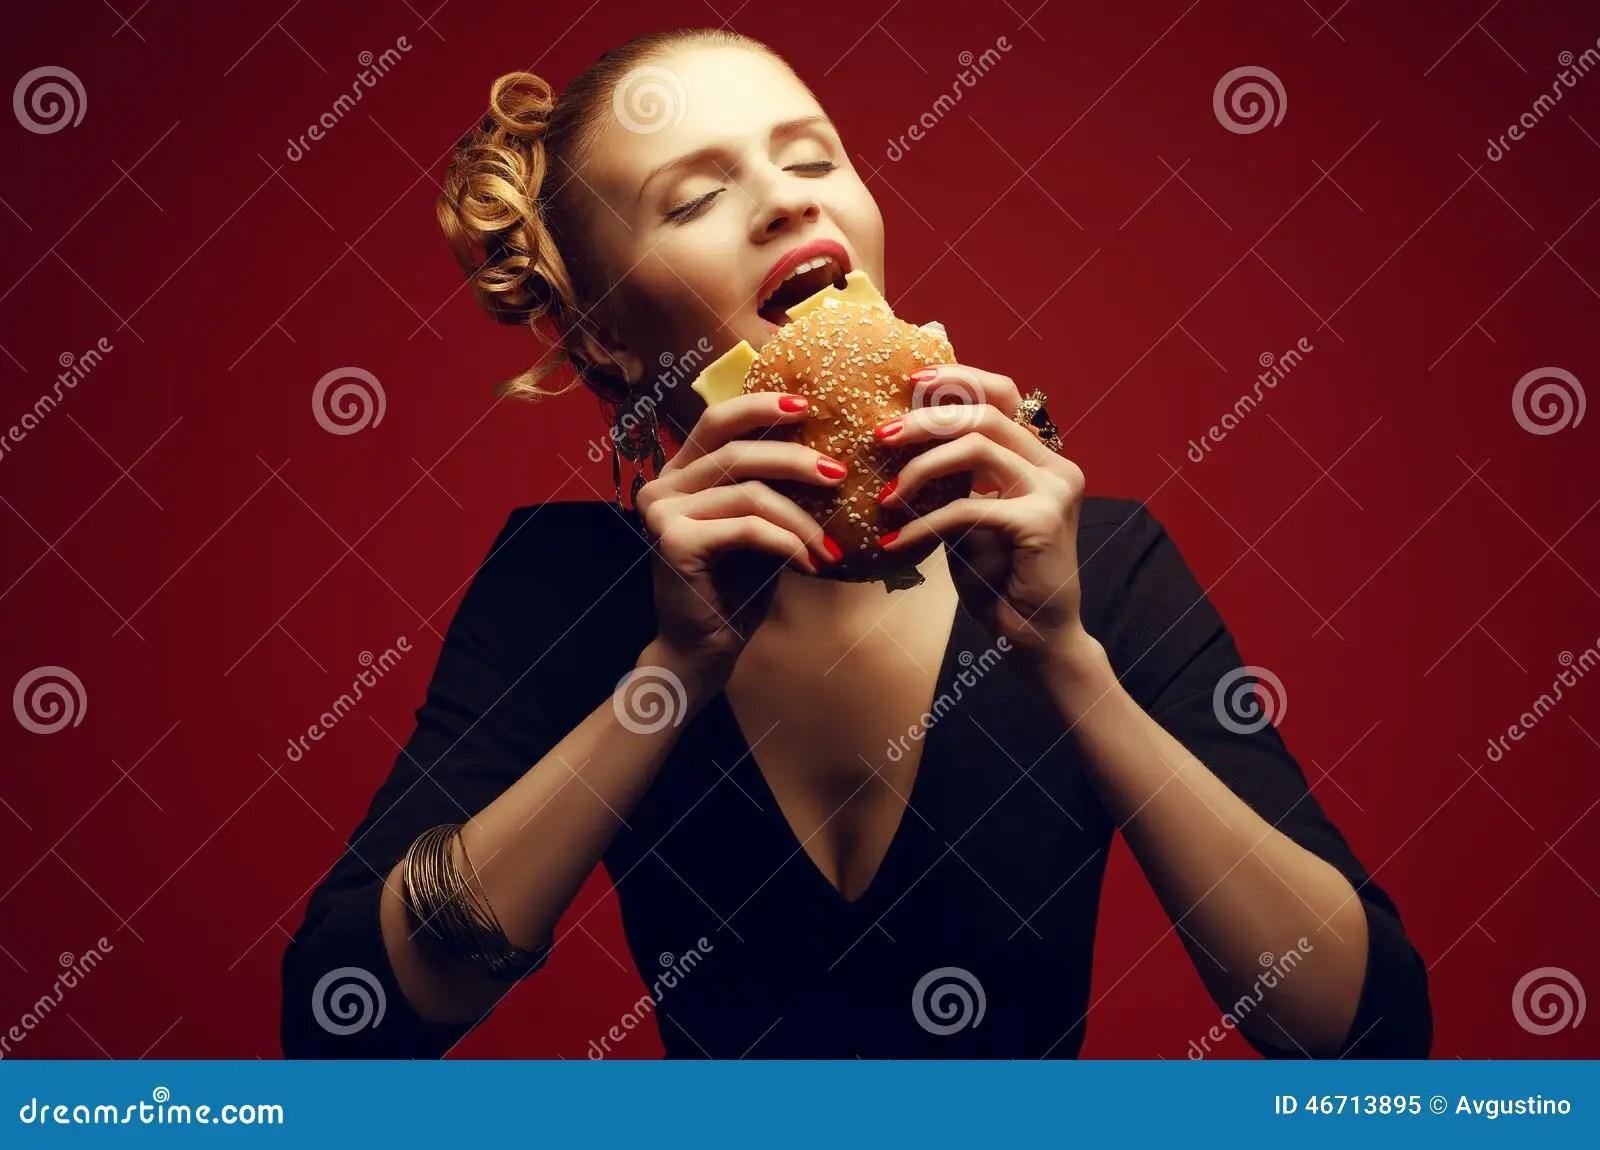 Guy Happy Burger Eating Fat